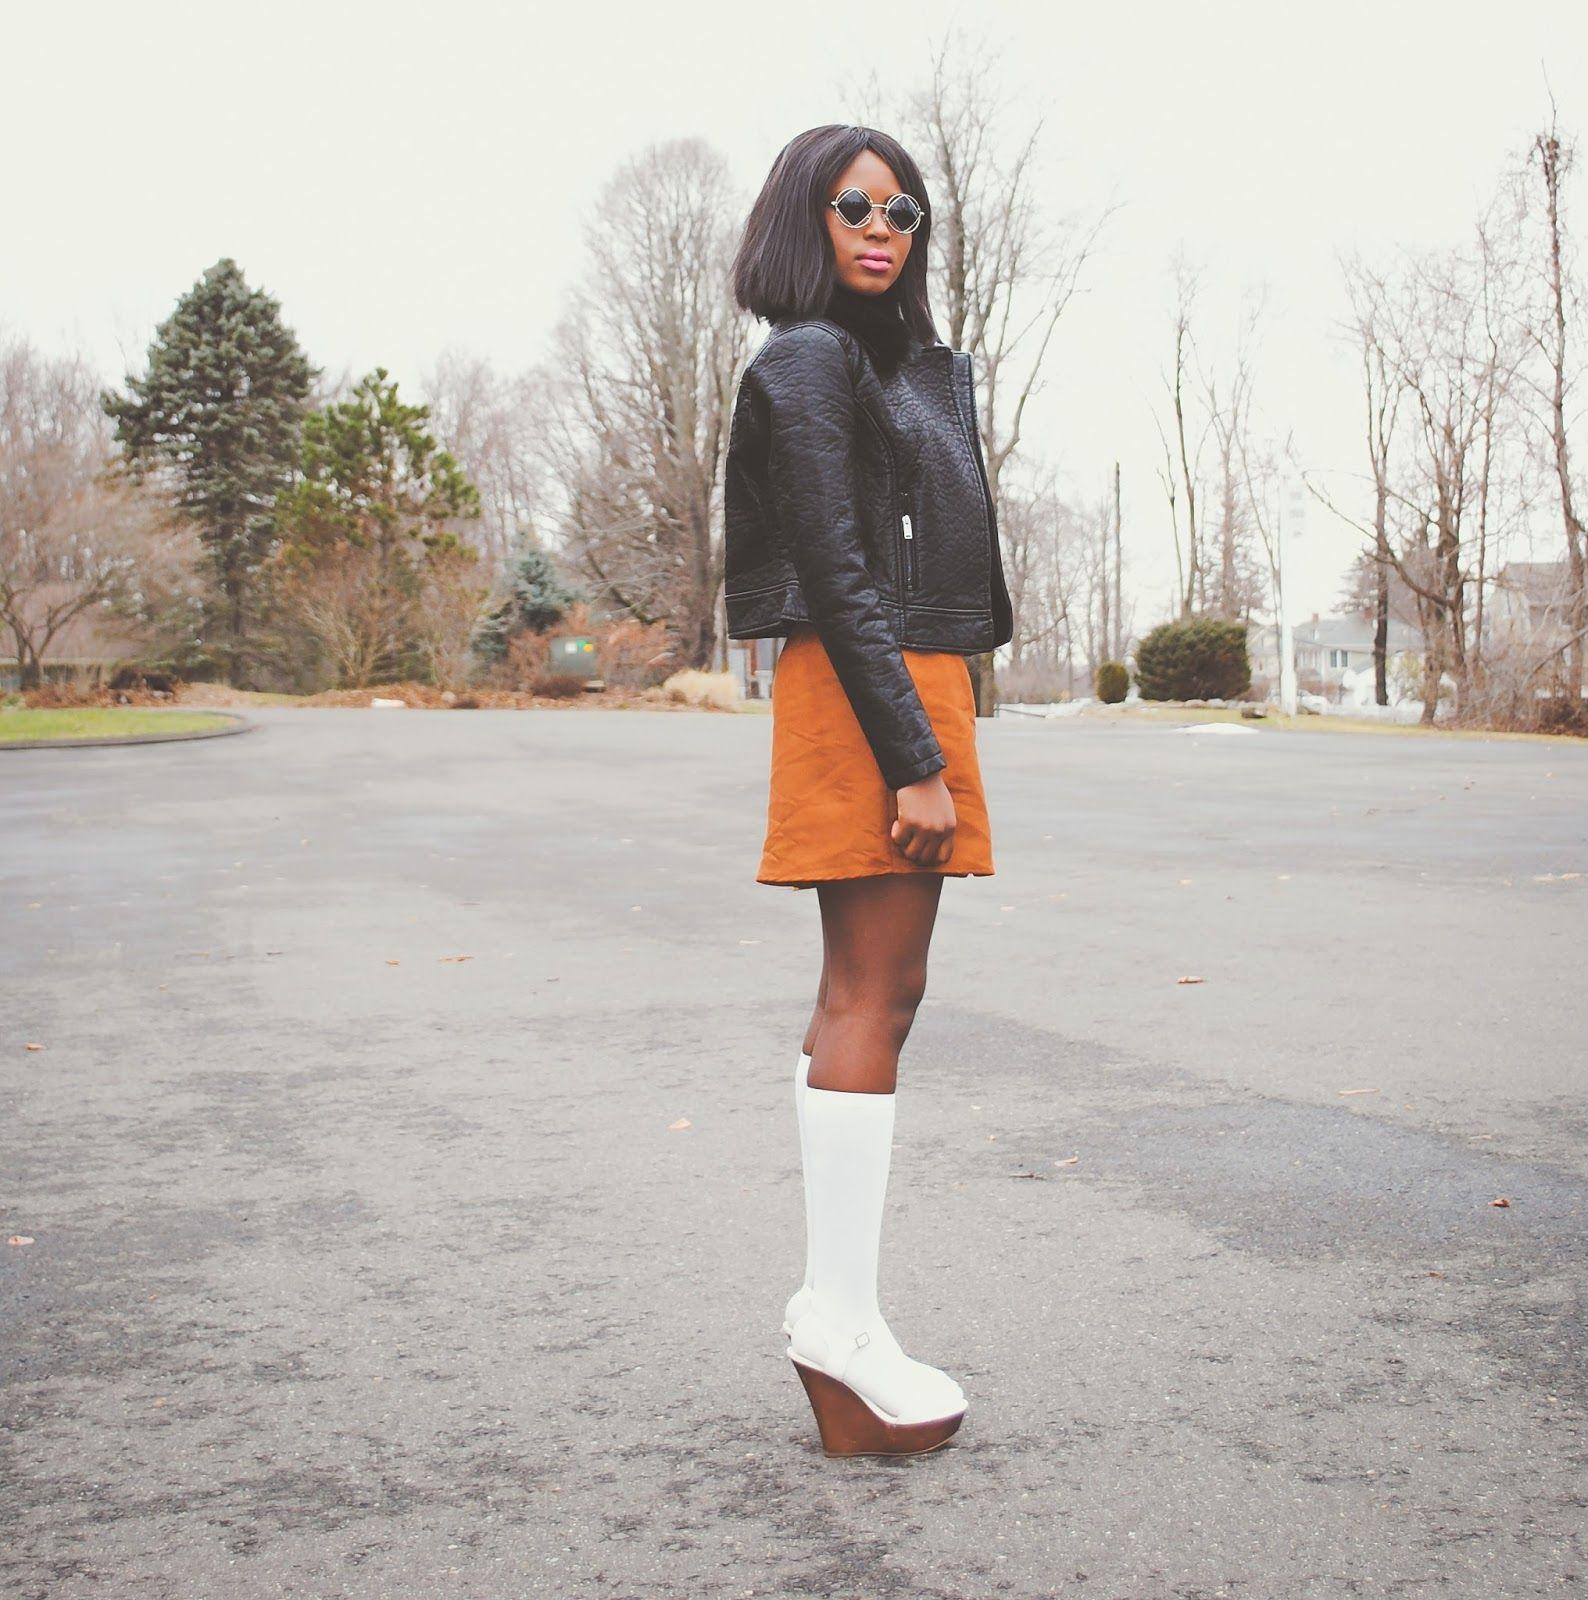 Tan Suede Skirt - I spy oby